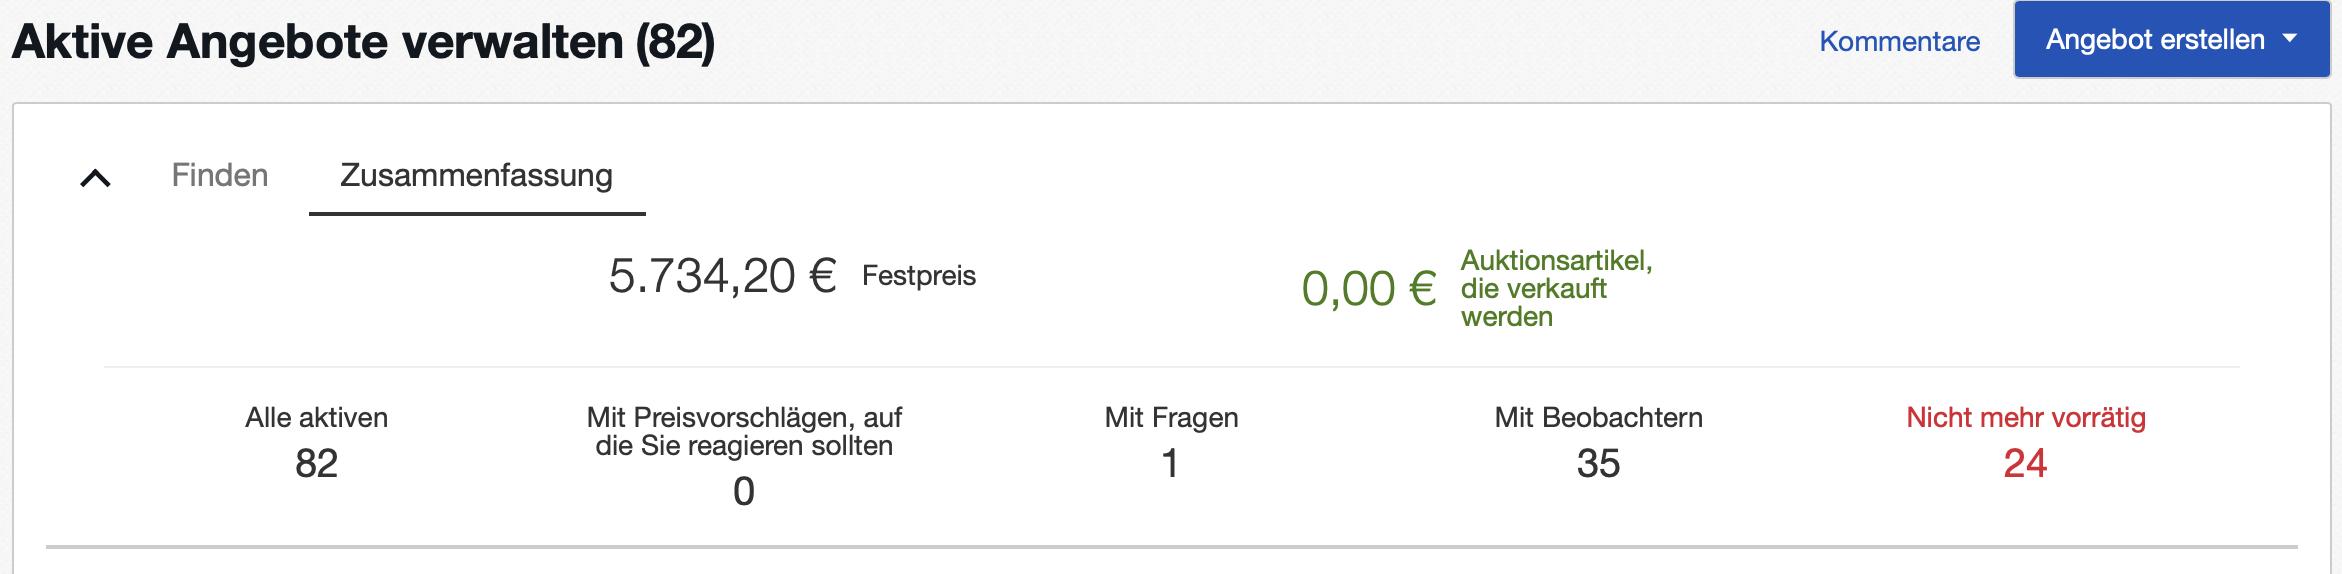 1_eBay aktive Angebote